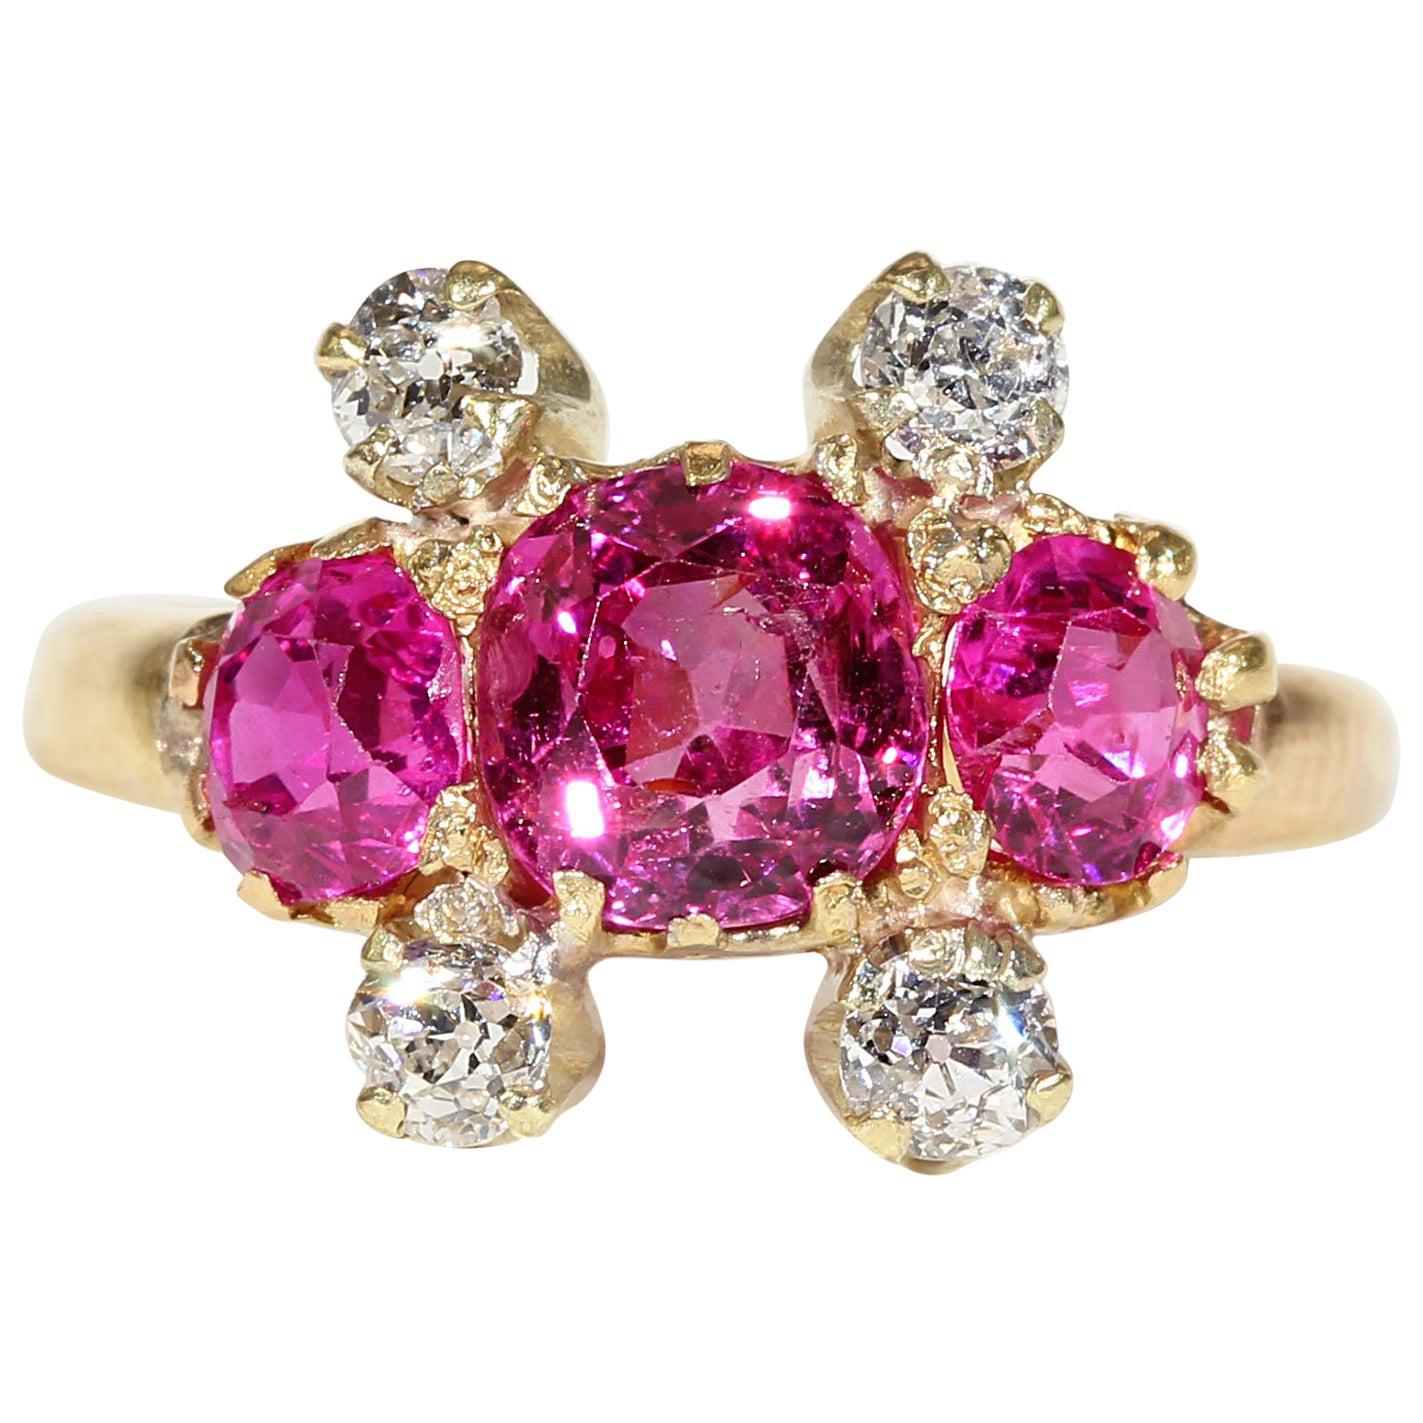 Antique Edwardian Ruby Diamond Ring Gypsy Set Gold Ring, 1909 at 1stdibs